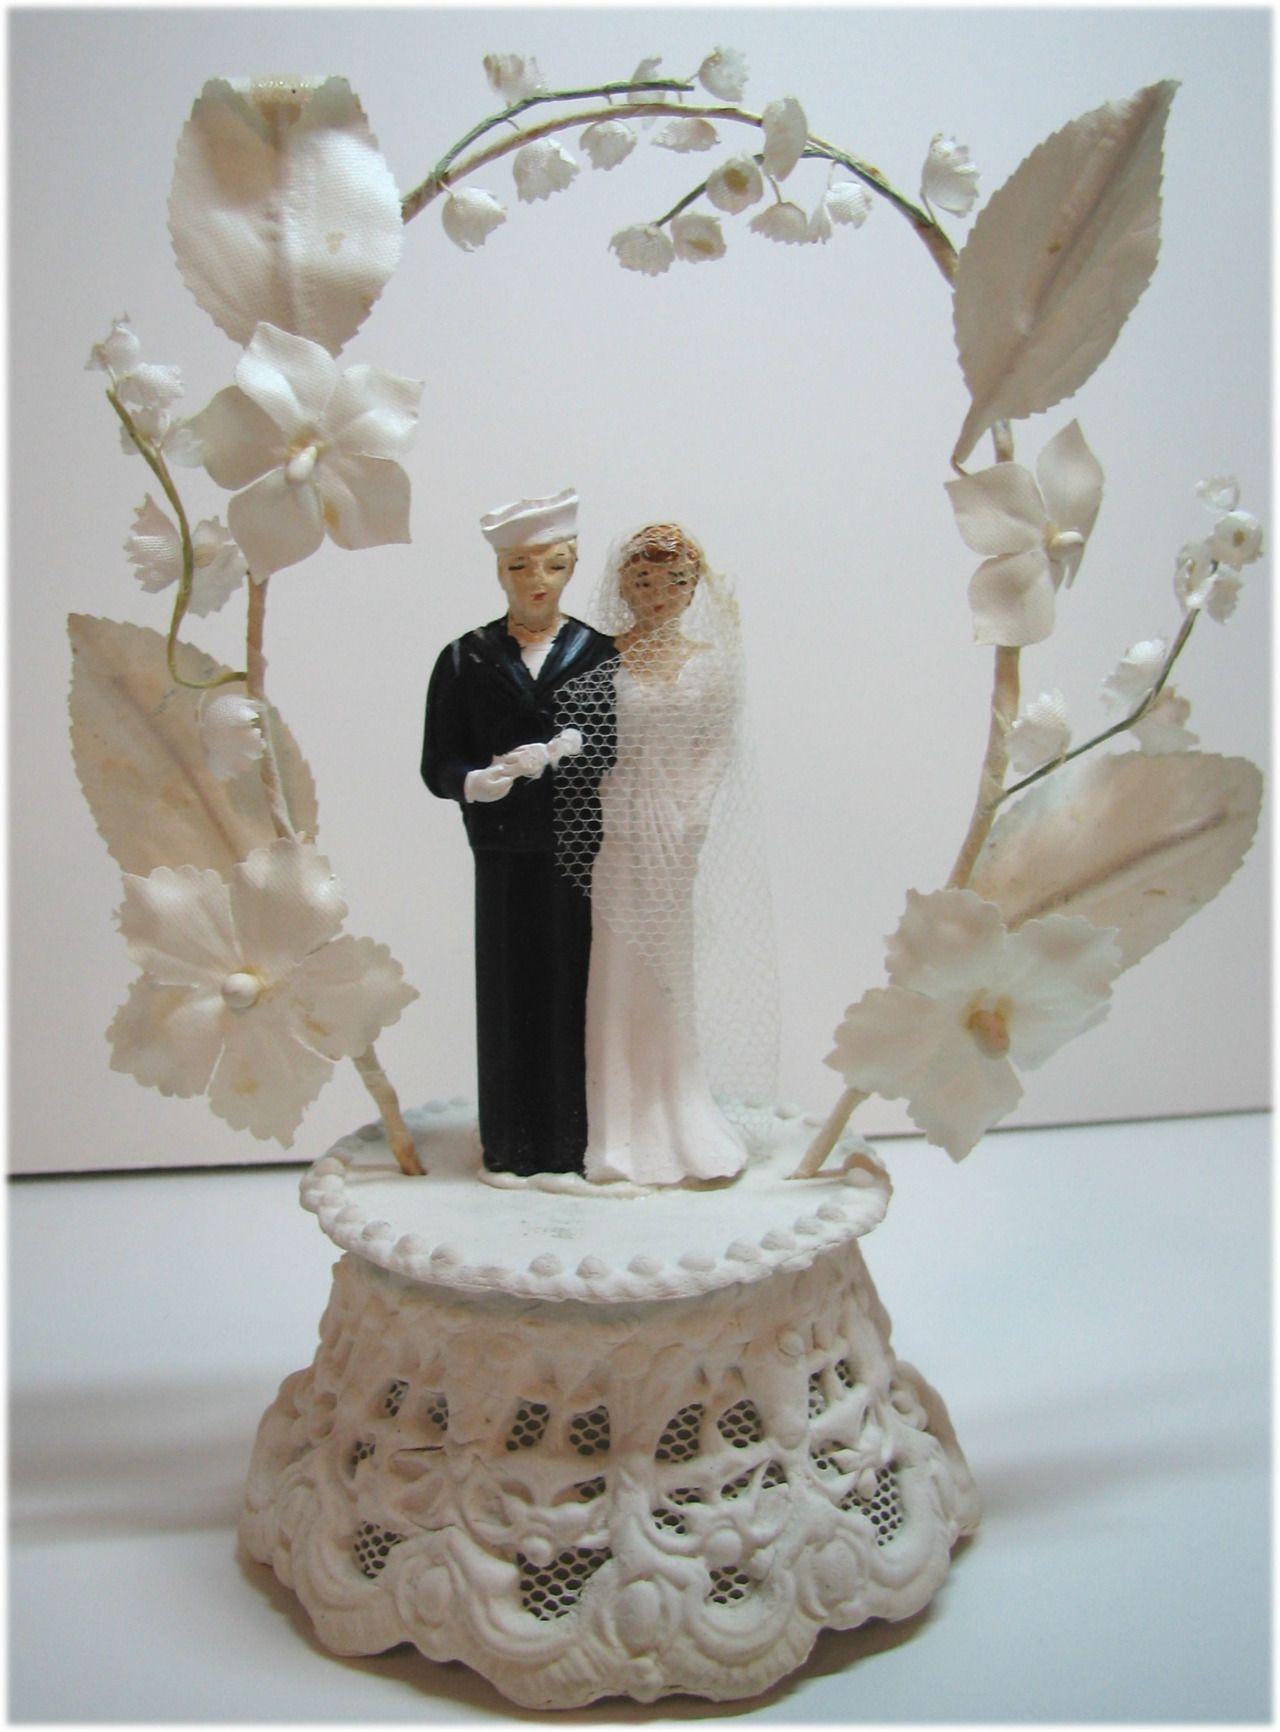 Pin by Marimerveille on Top cake u Vintage wedding cake topper